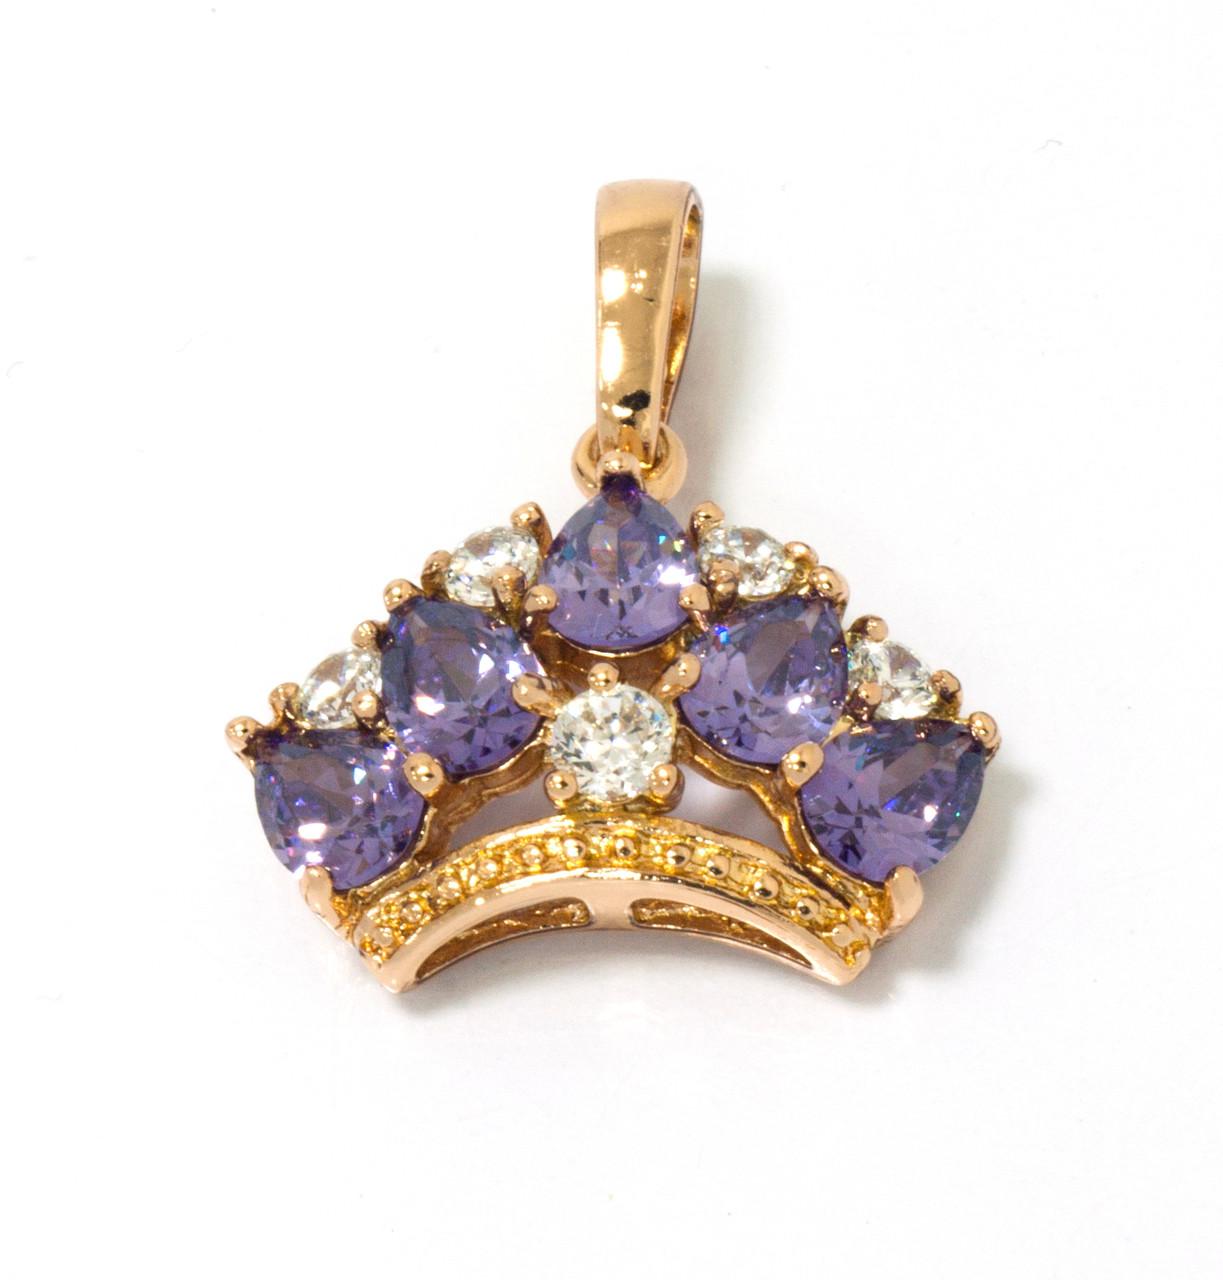 Кулон Корона,с фиолетовым цирконием, р.22мм*20мм, позолота